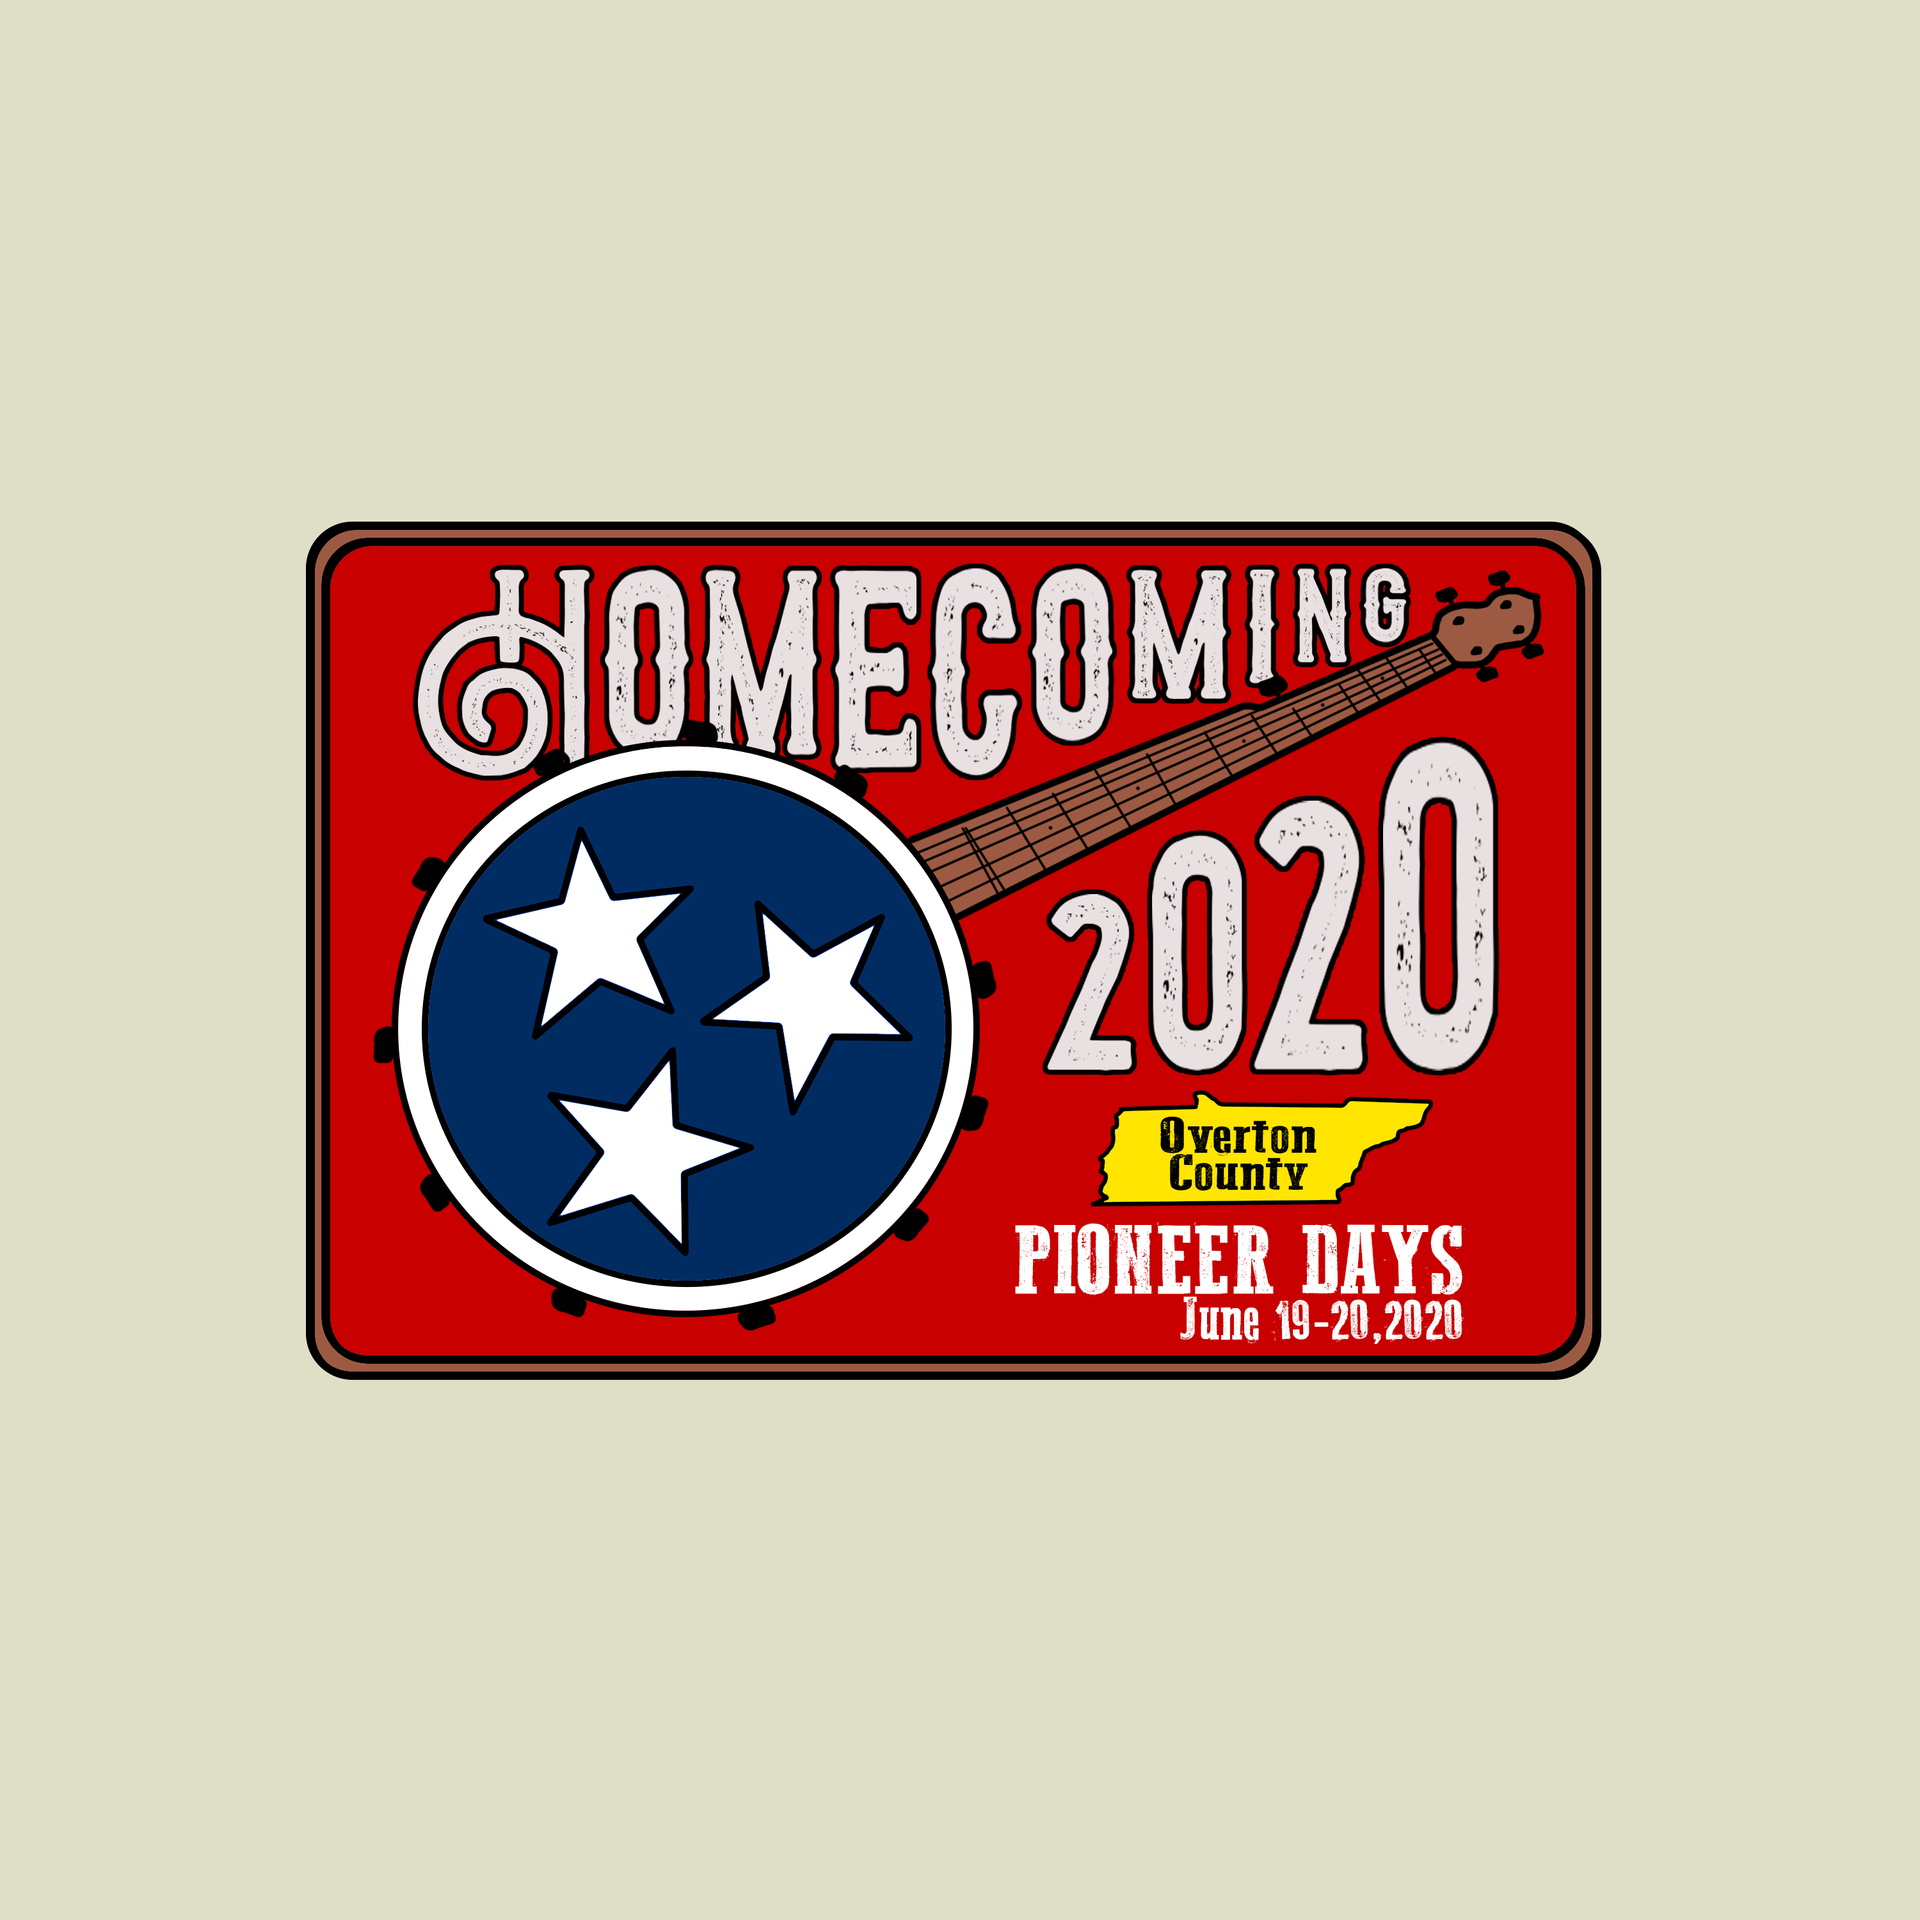 Overton County Pioneer Days 2020